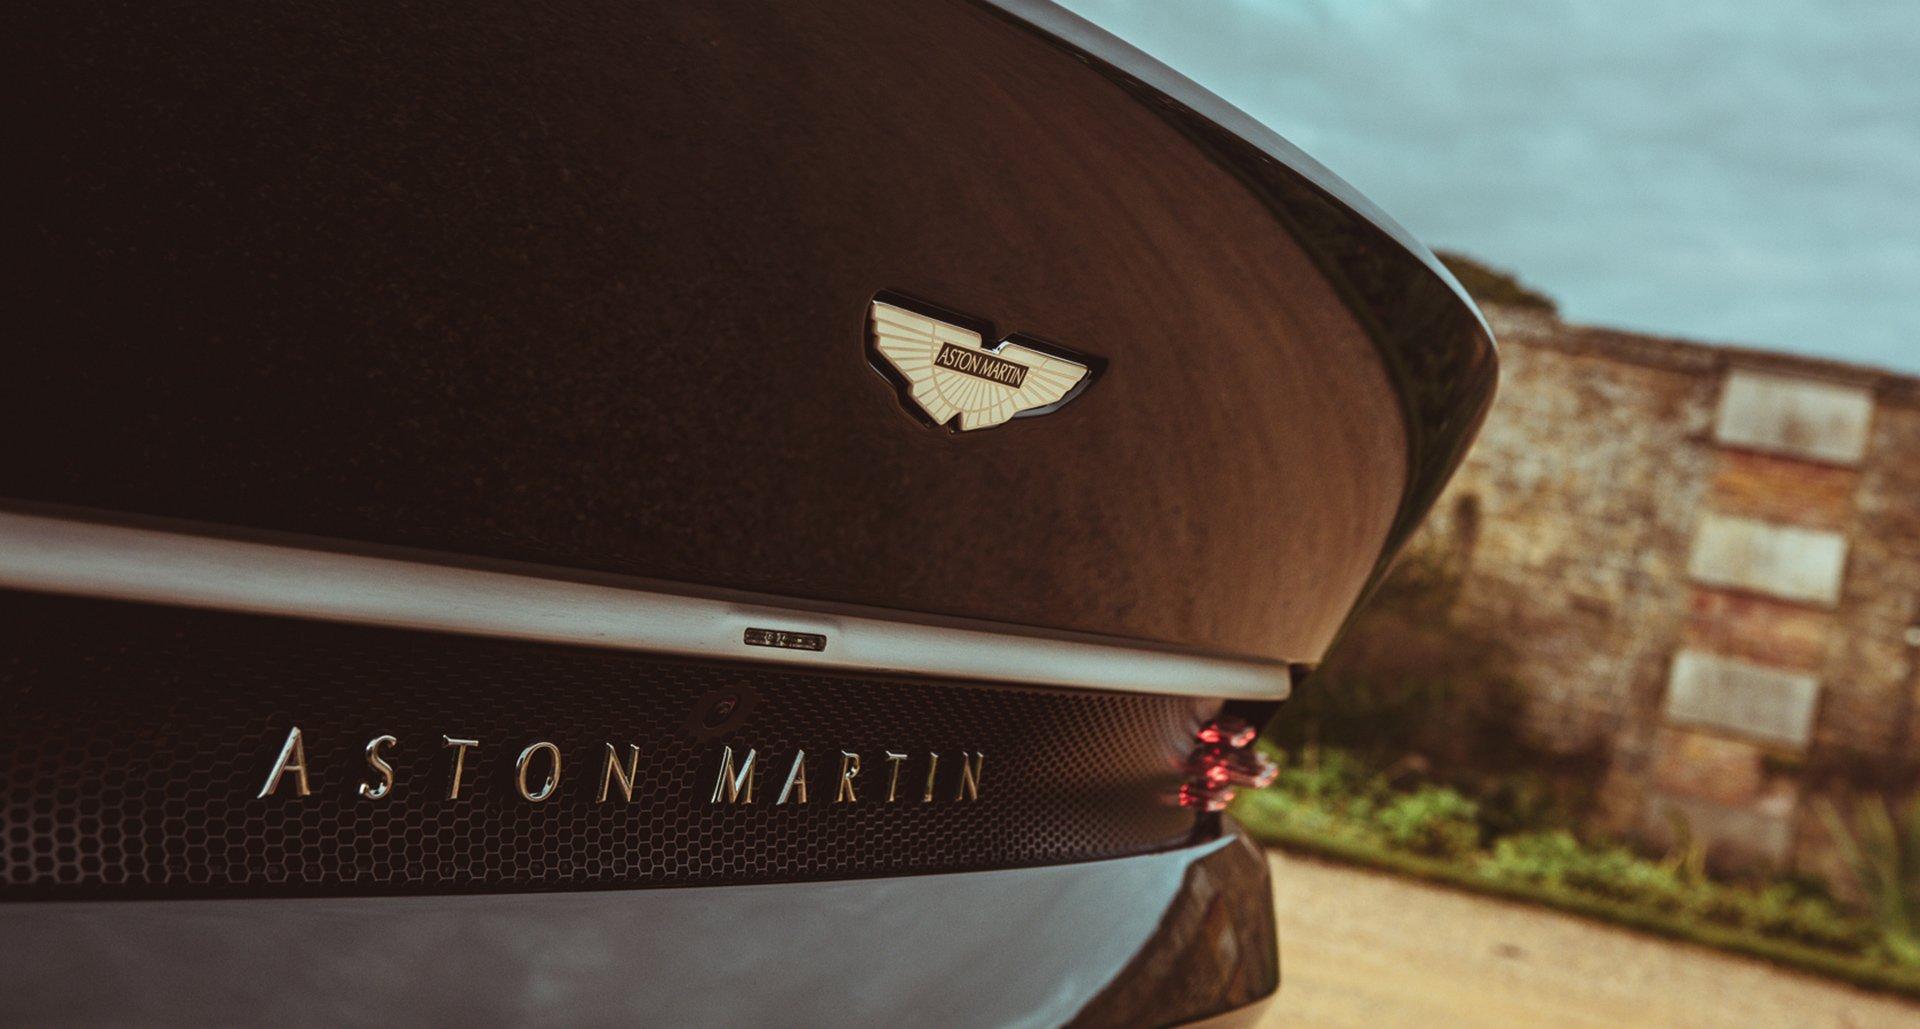 Aston Martn Badge